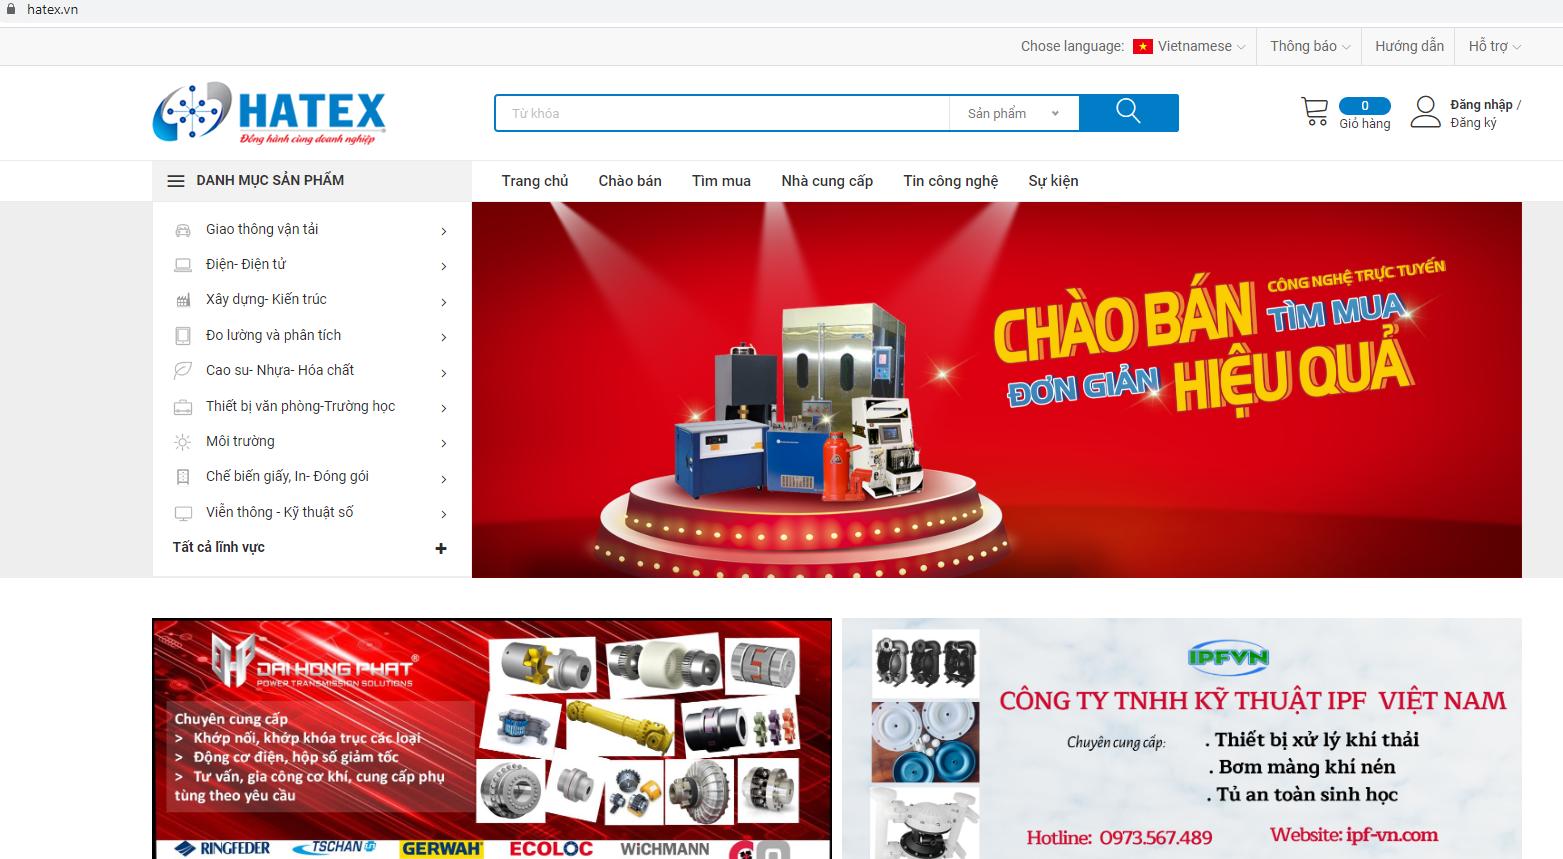 Trang chủ Hatex.vn